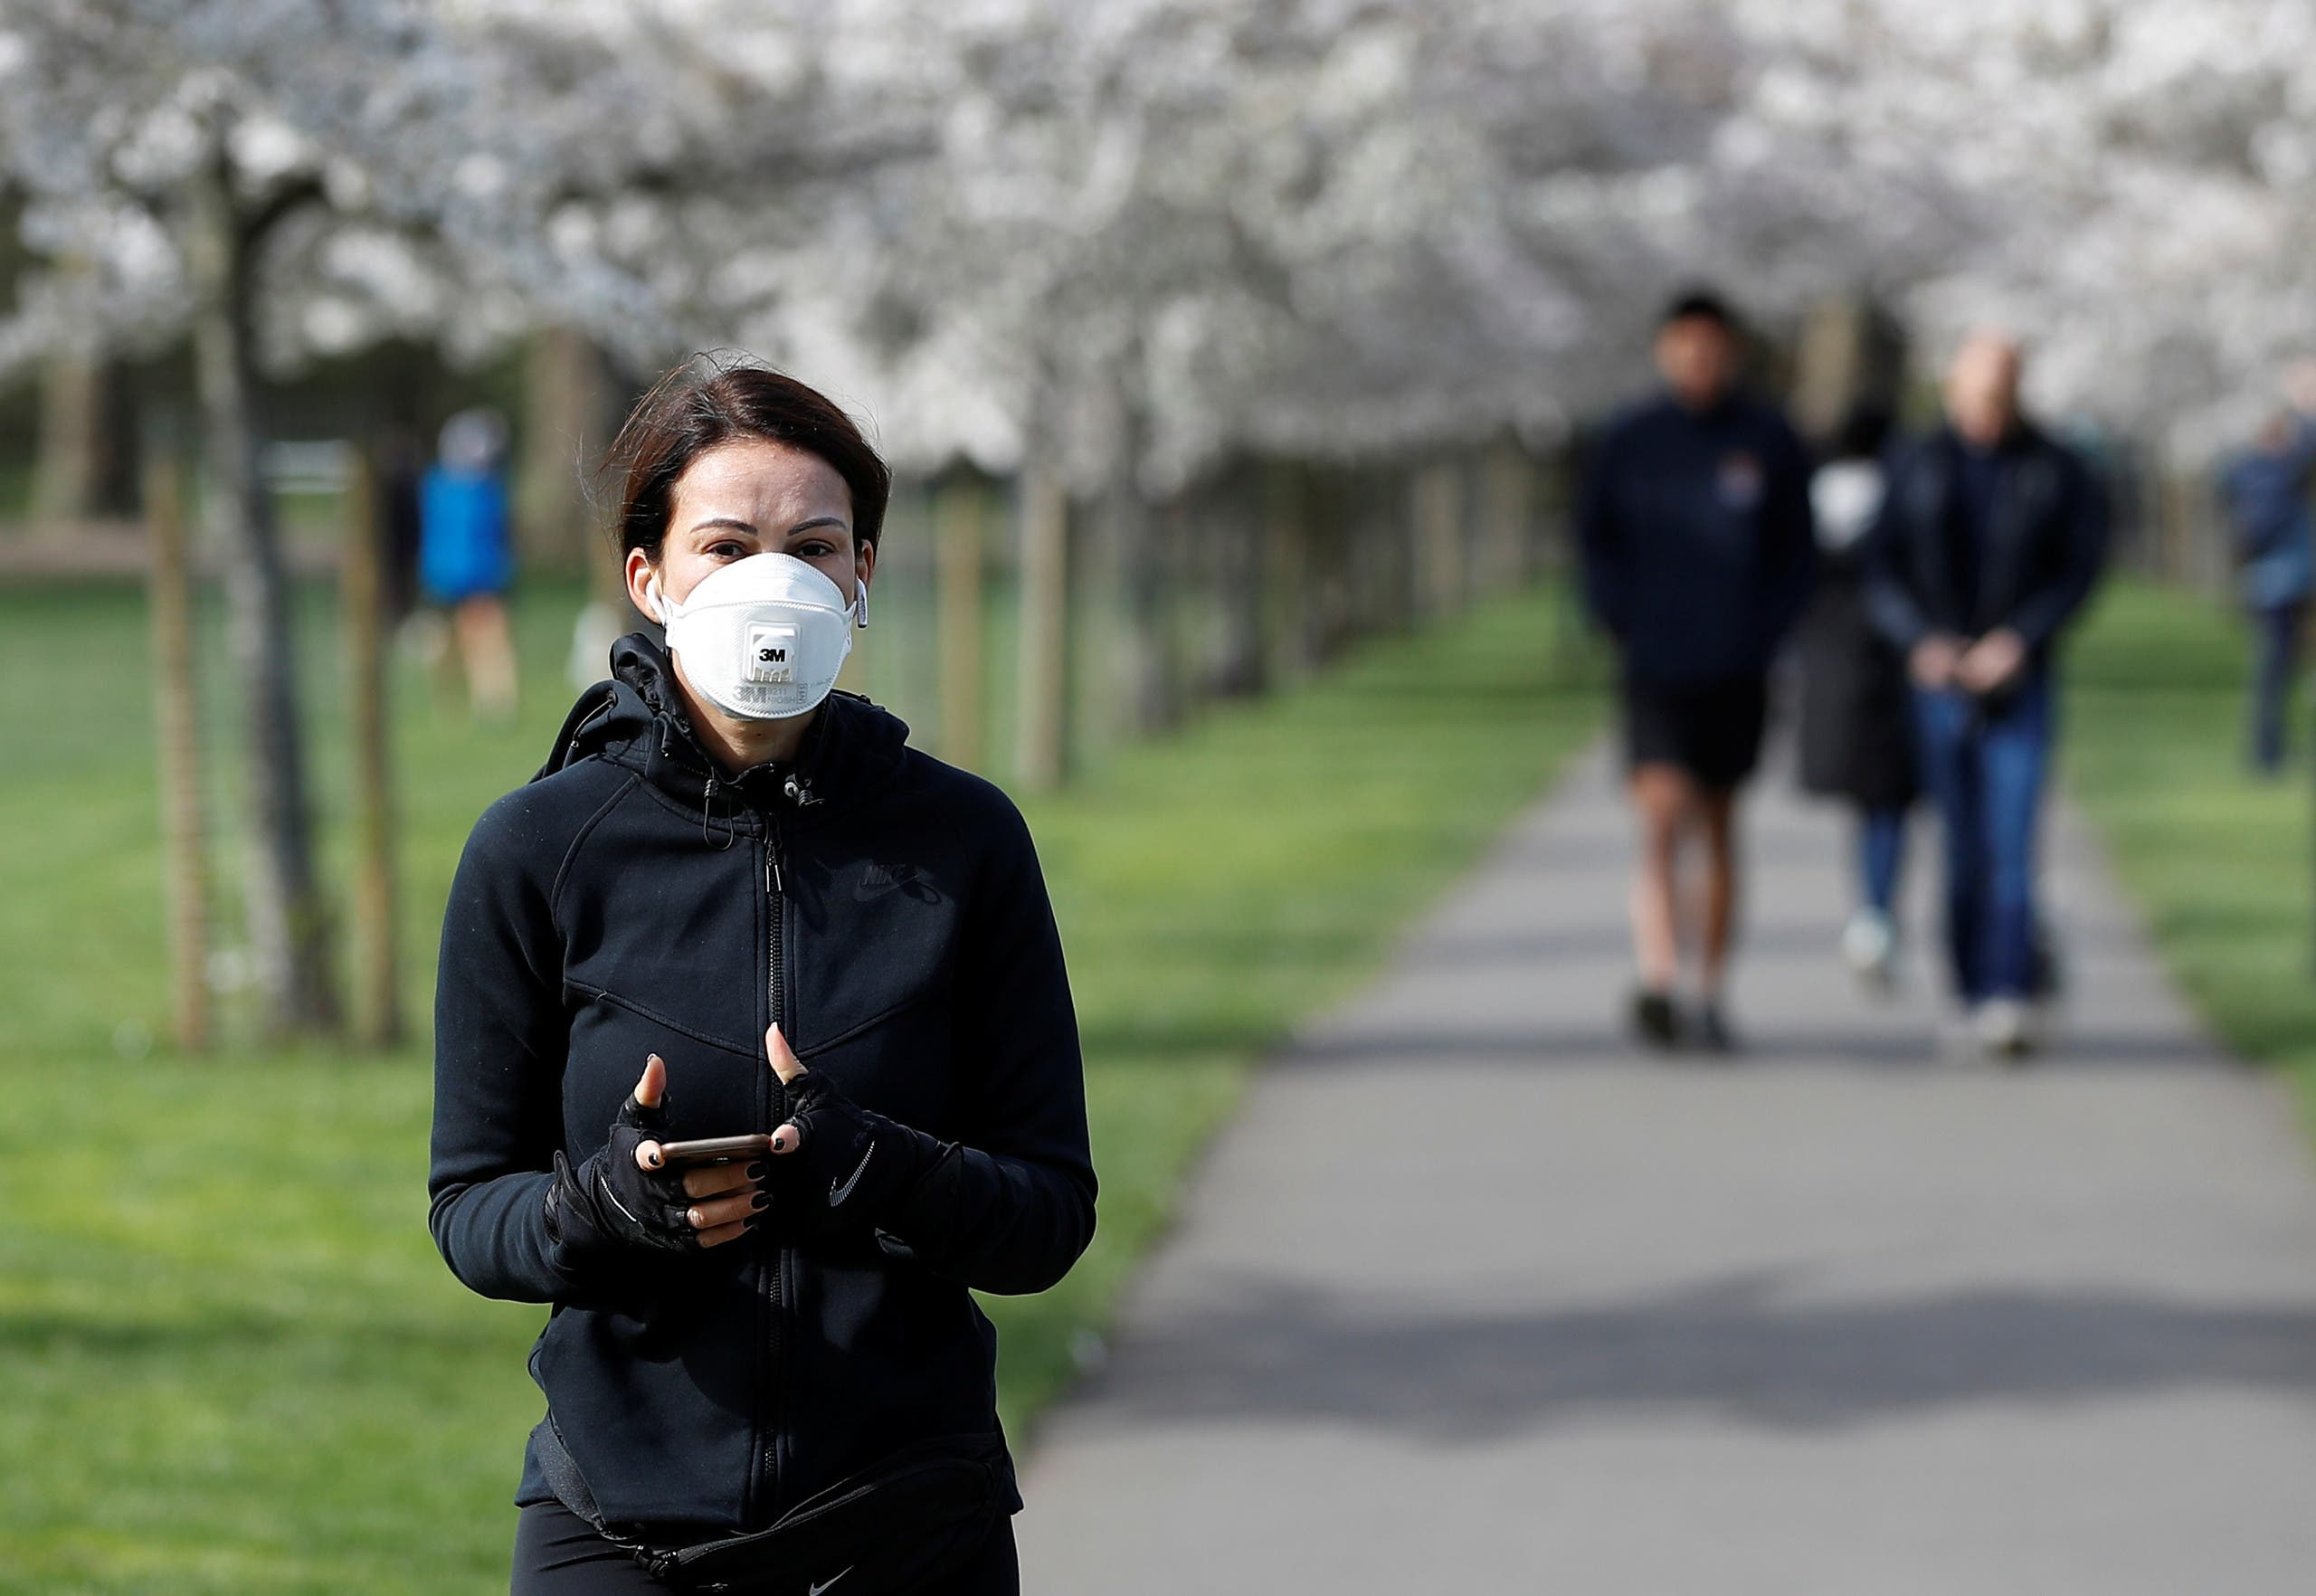 فيروس كورونا بريطانيا